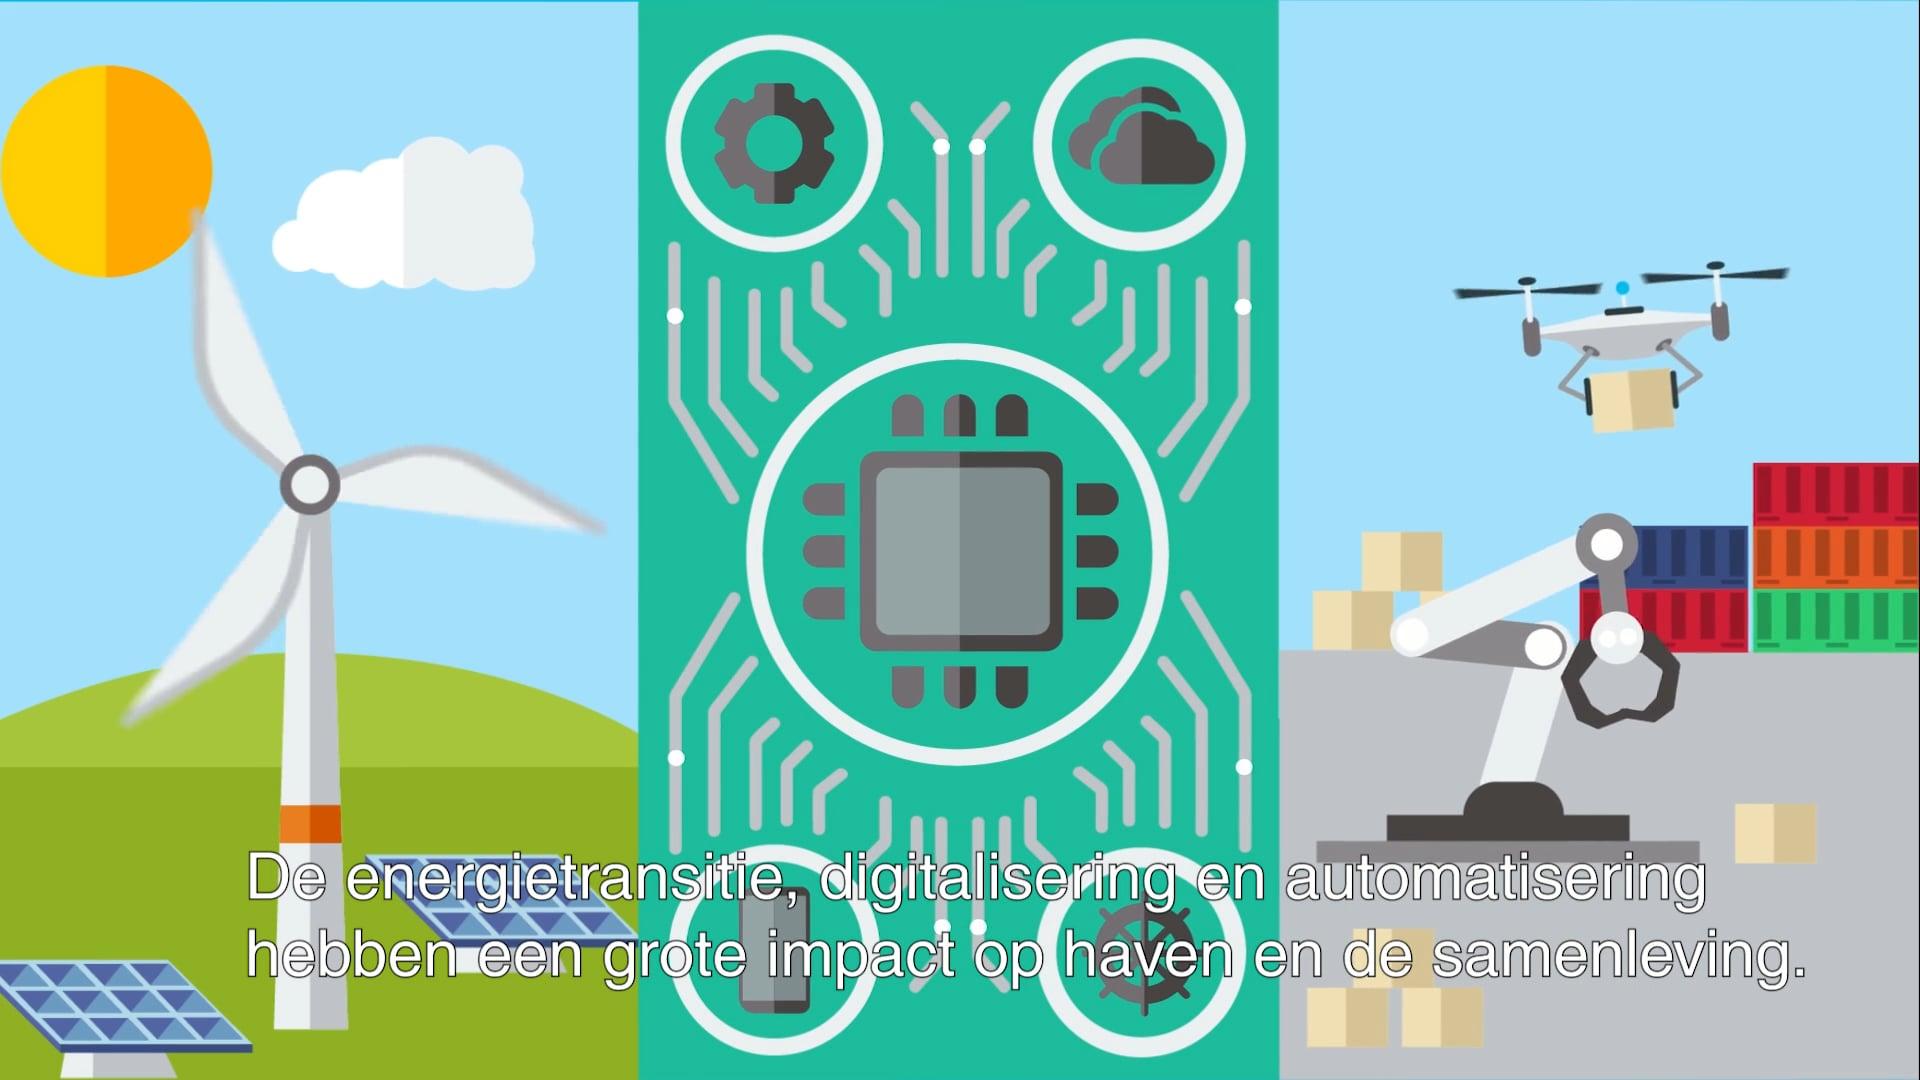 ROTTERDAMS HAVENBEDRIJF | SmartPort Summit 2019